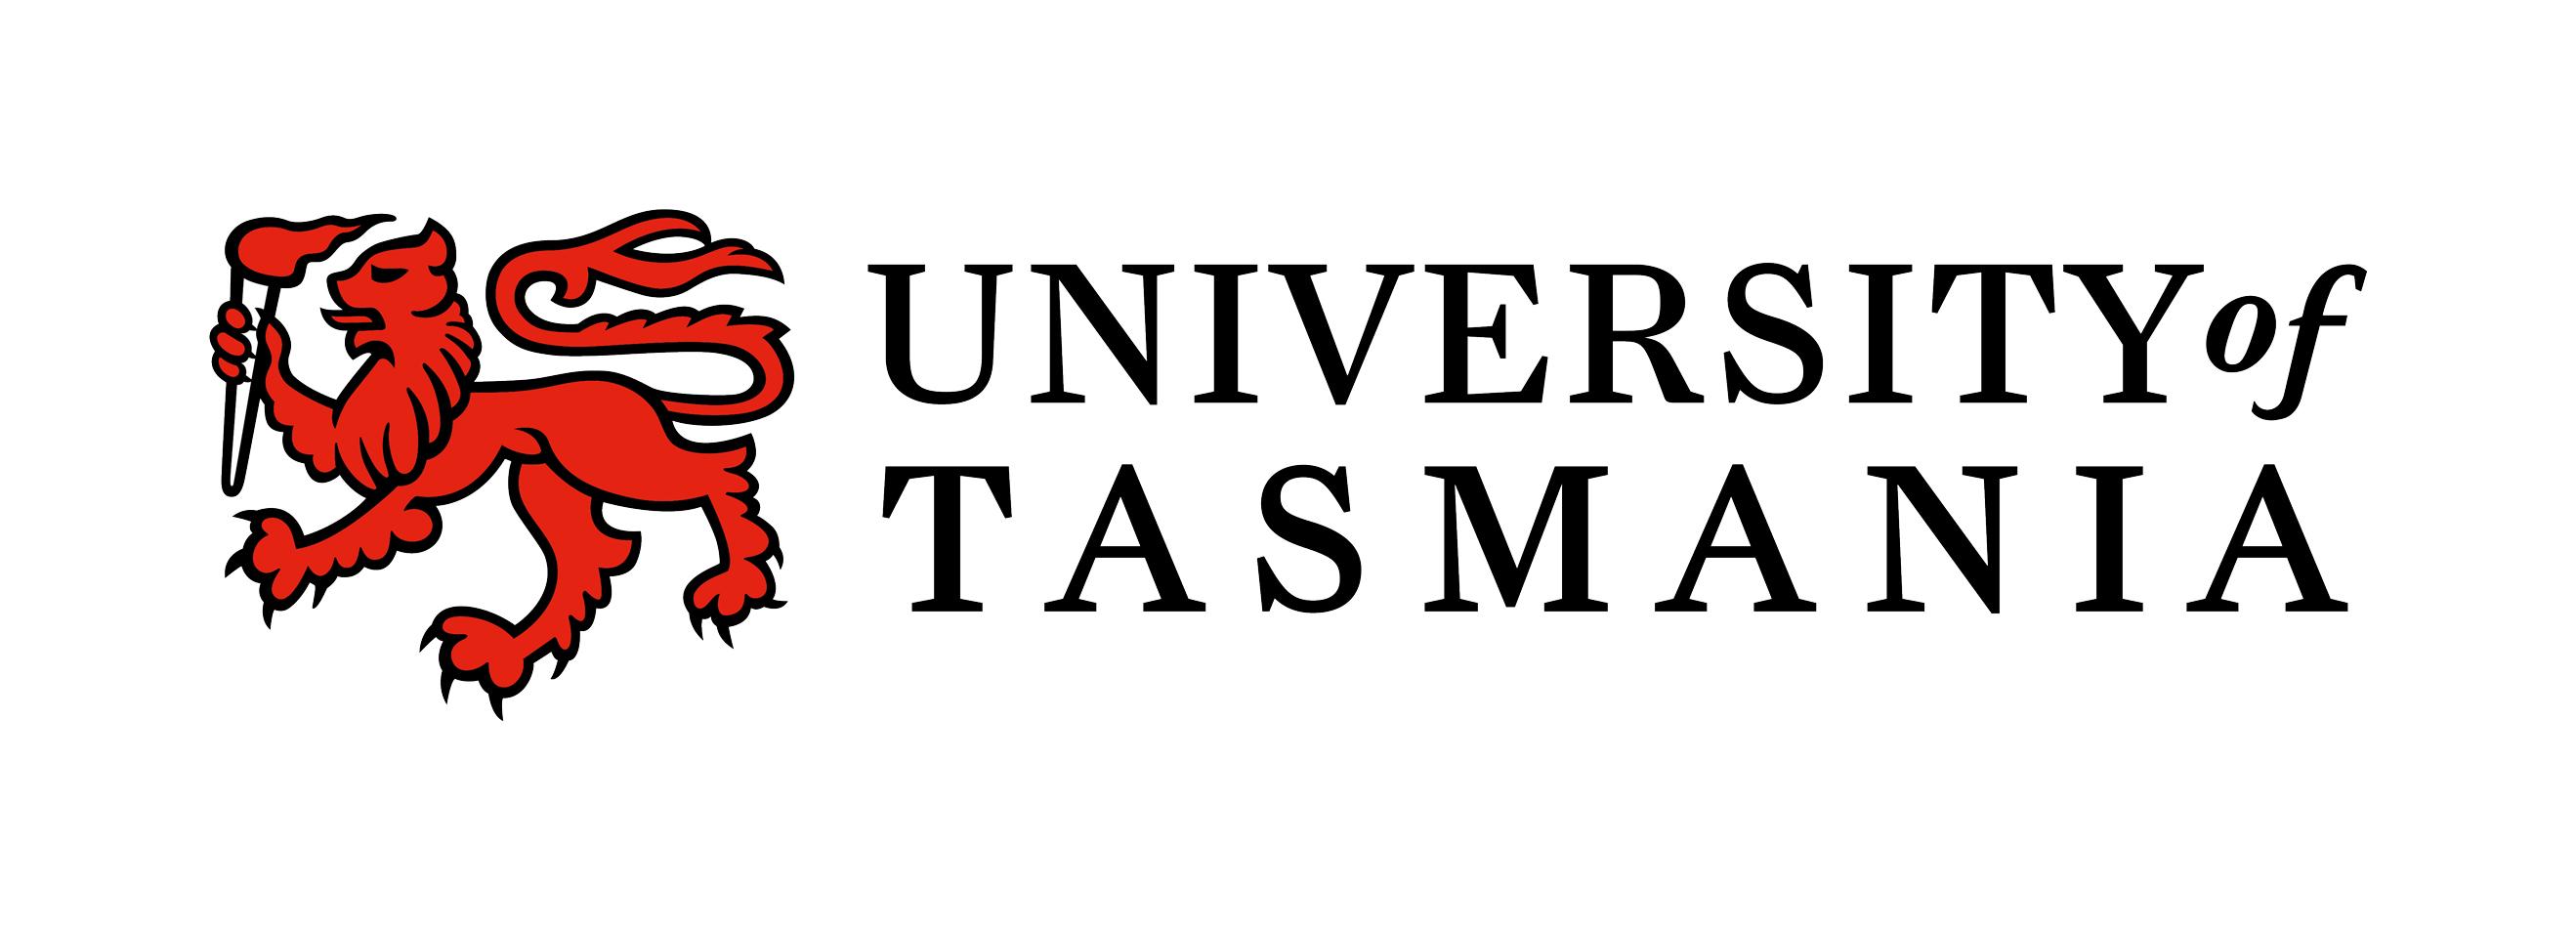 University of Tasmania Logo